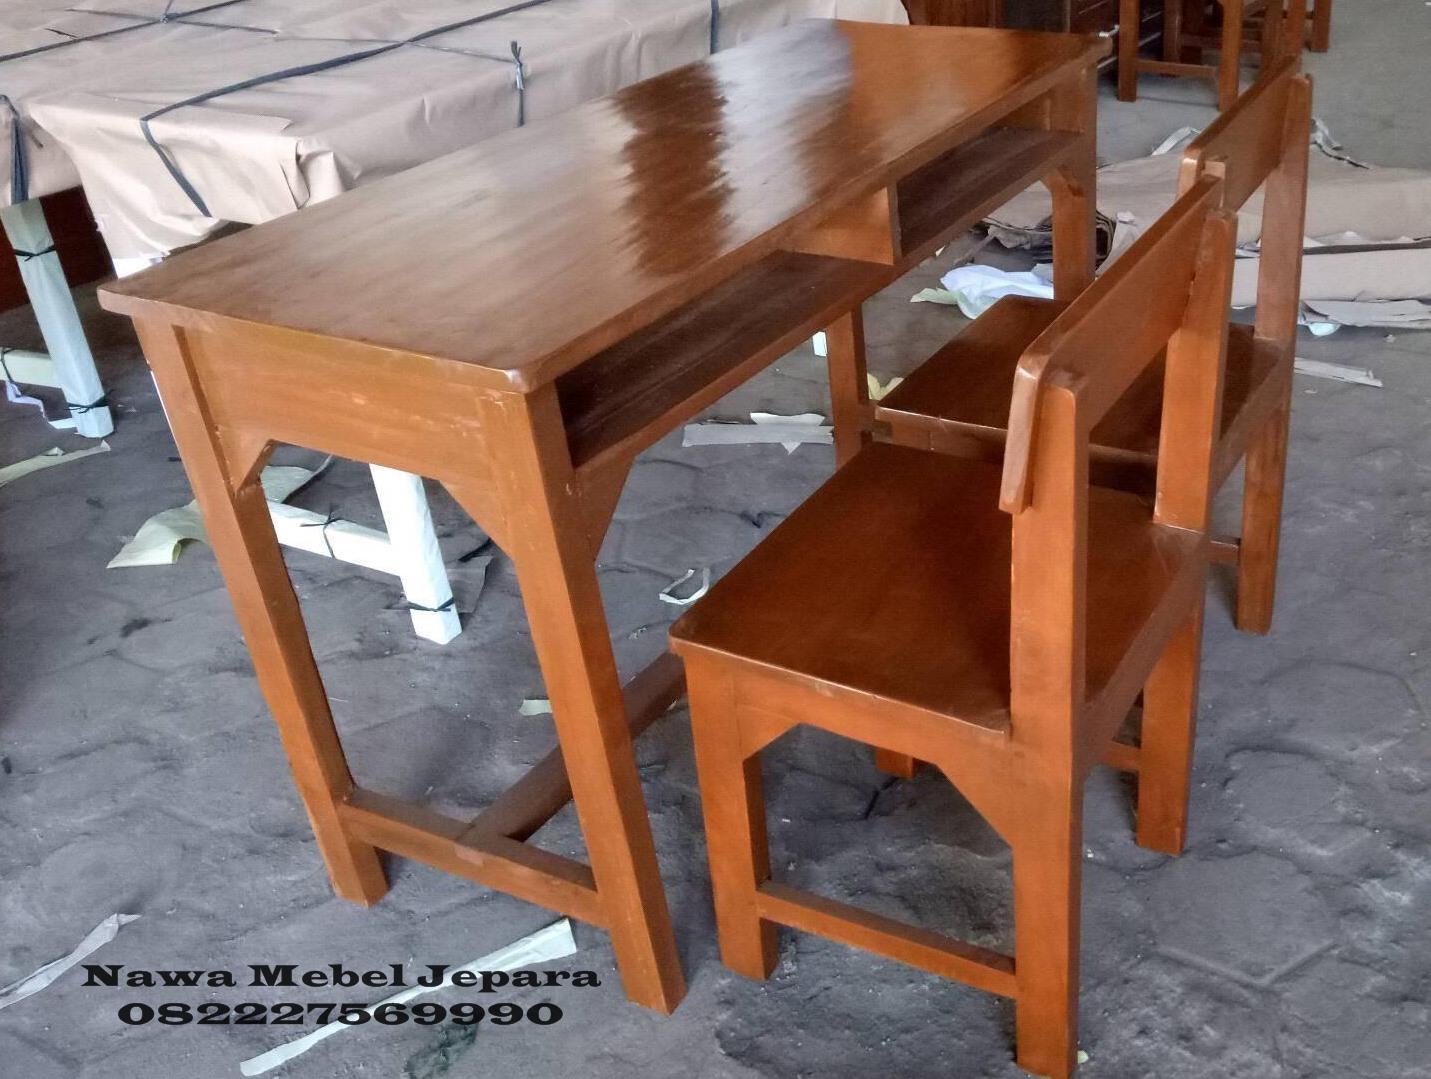 Meja-Kursi-sekolah-double-Jati-2 Harga Meja Kursi Sekolah Single 2017